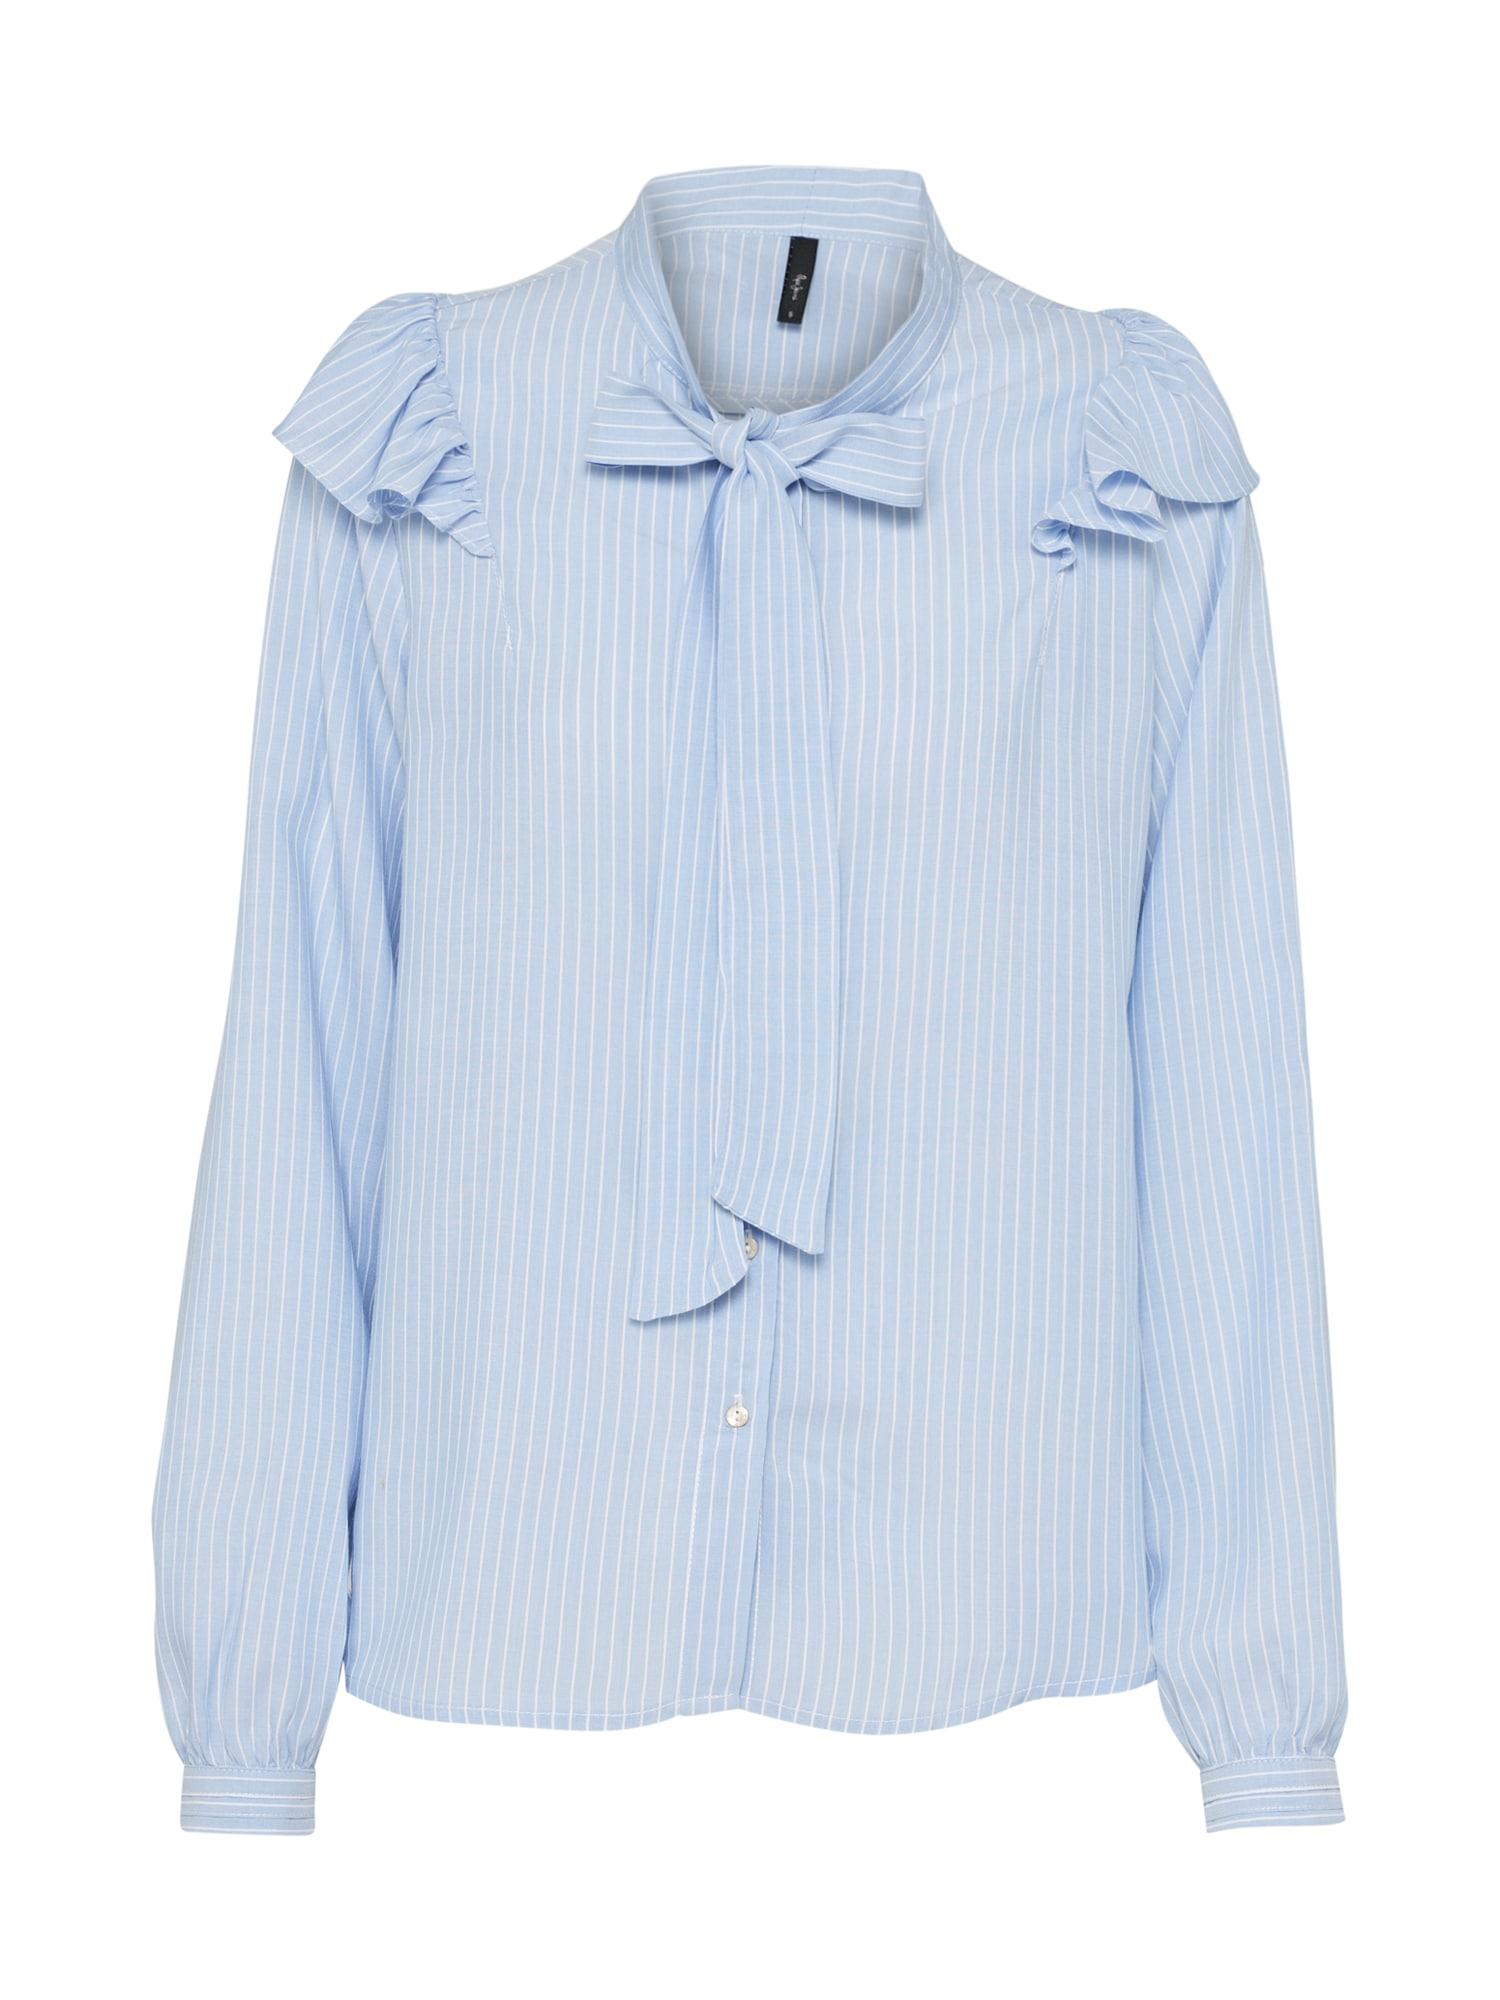 Pepe Jeans Dames Blouse AYUMI blauw wit